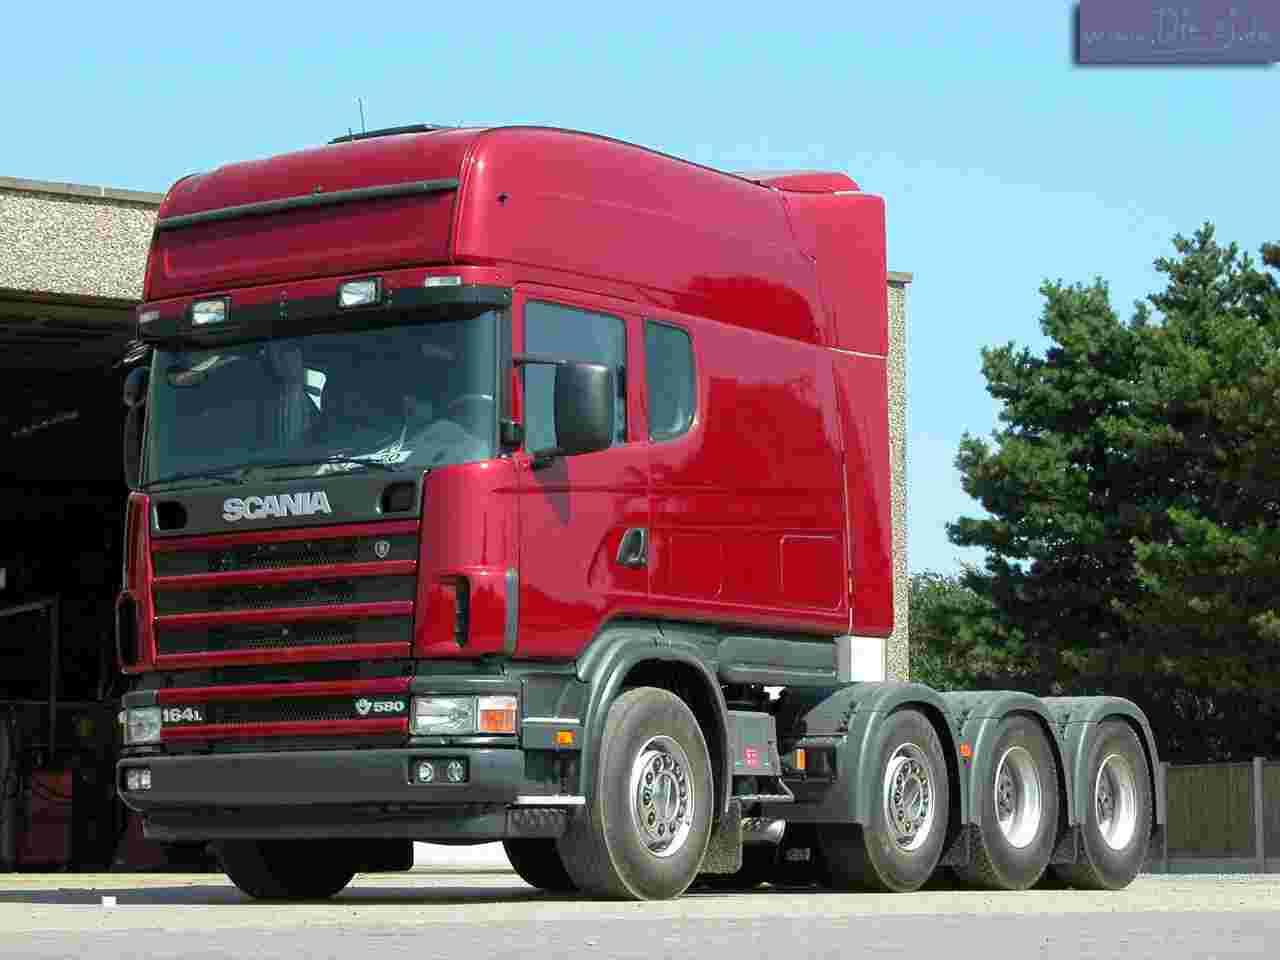 Scania R164L 01 Wallpaper